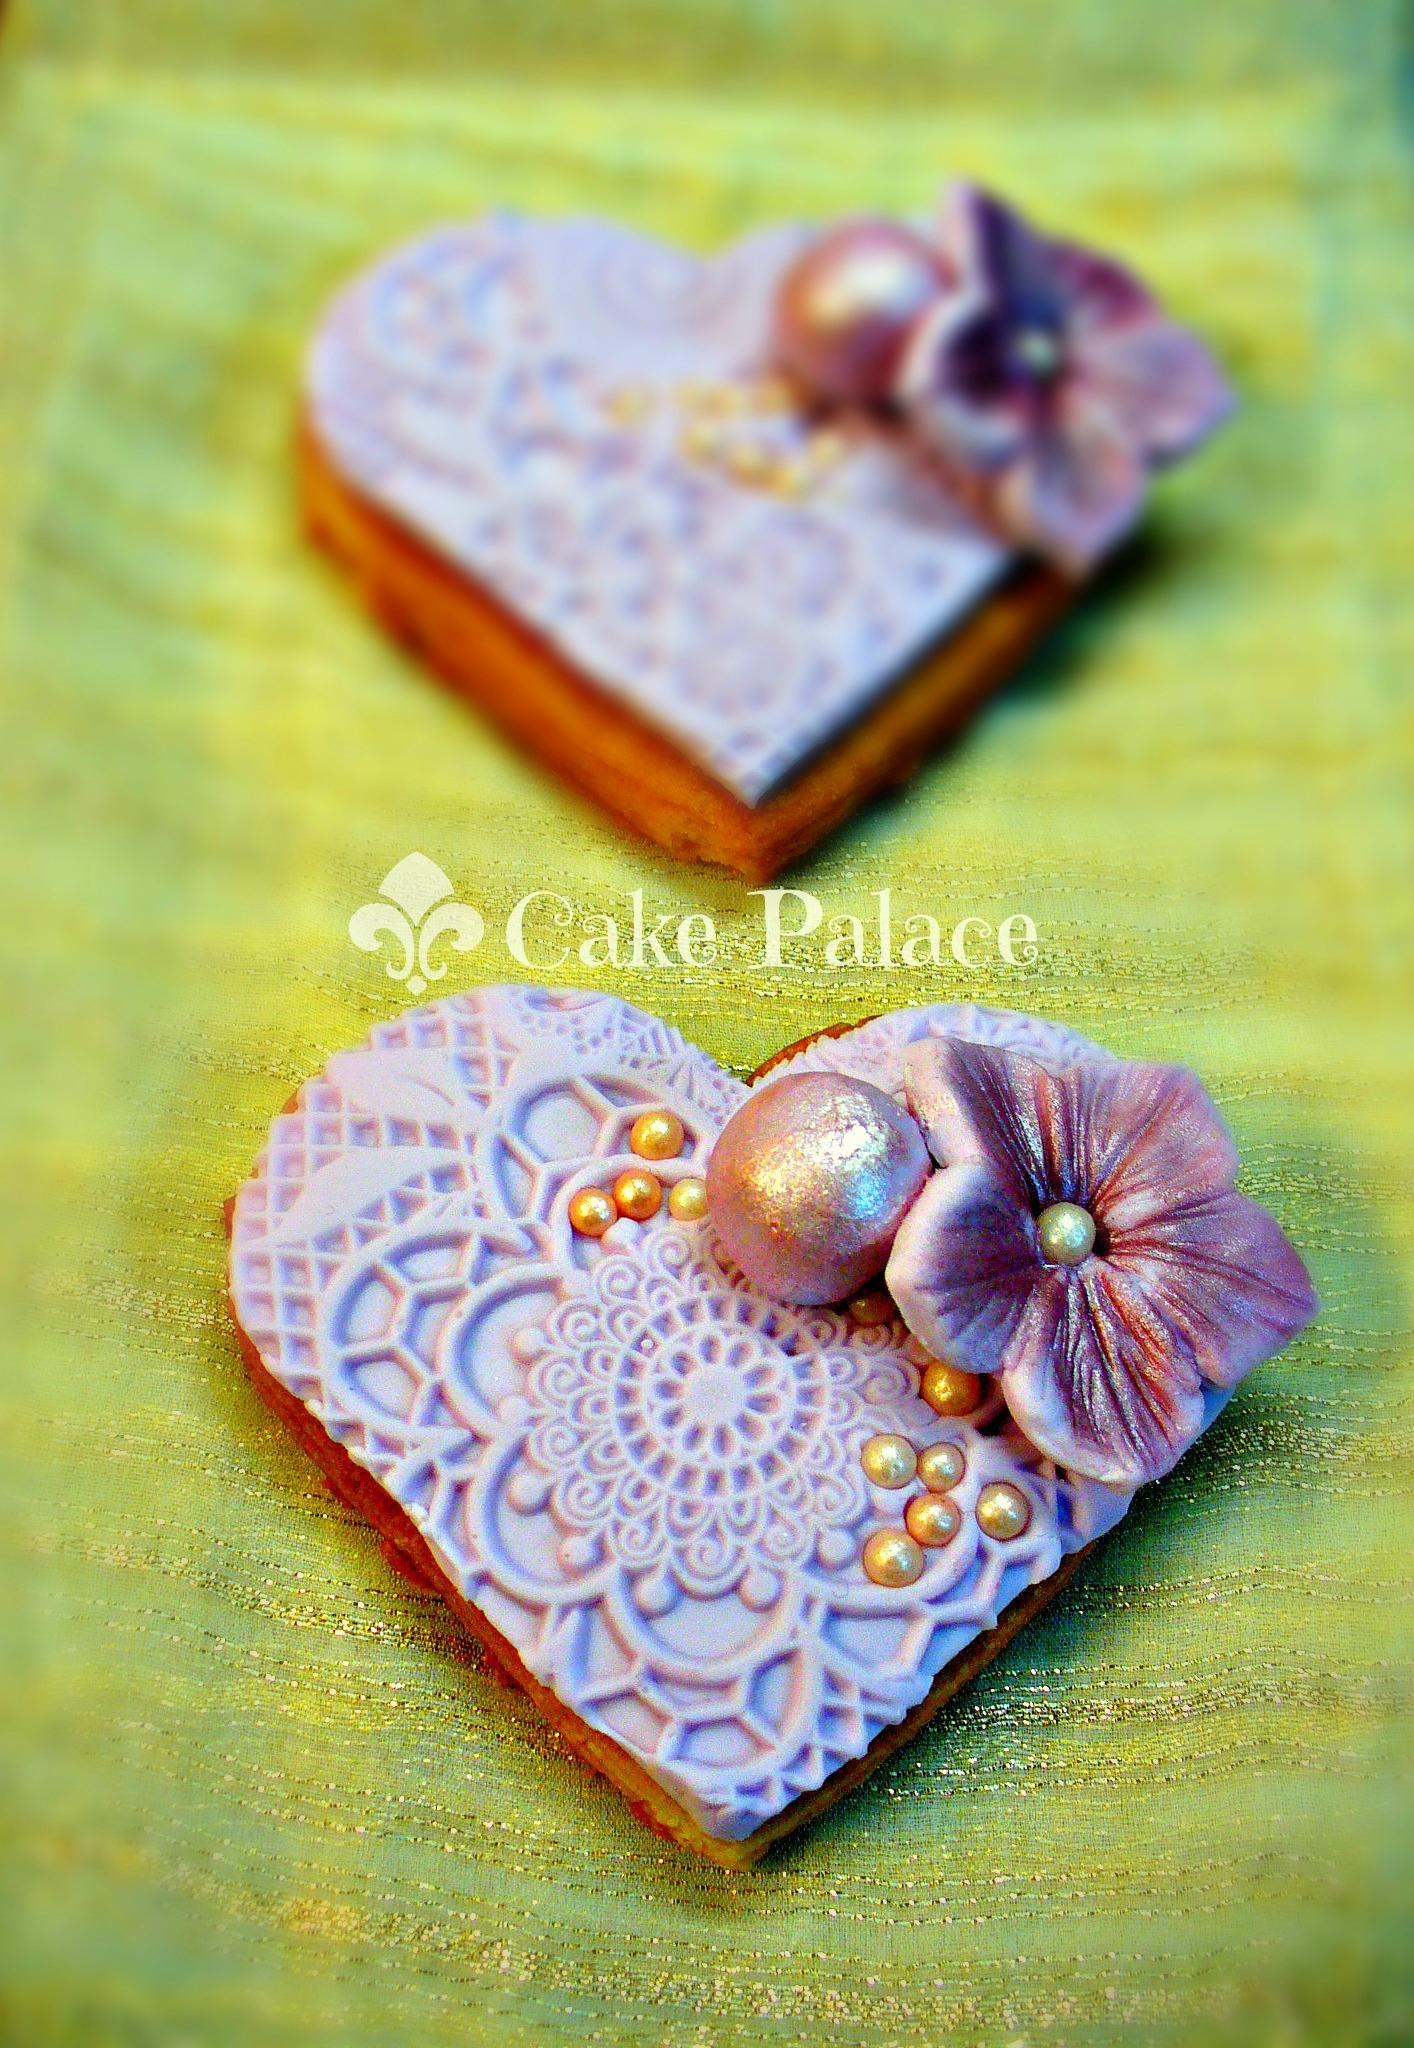 Vintage Lace Cookies - CakeCentral.com